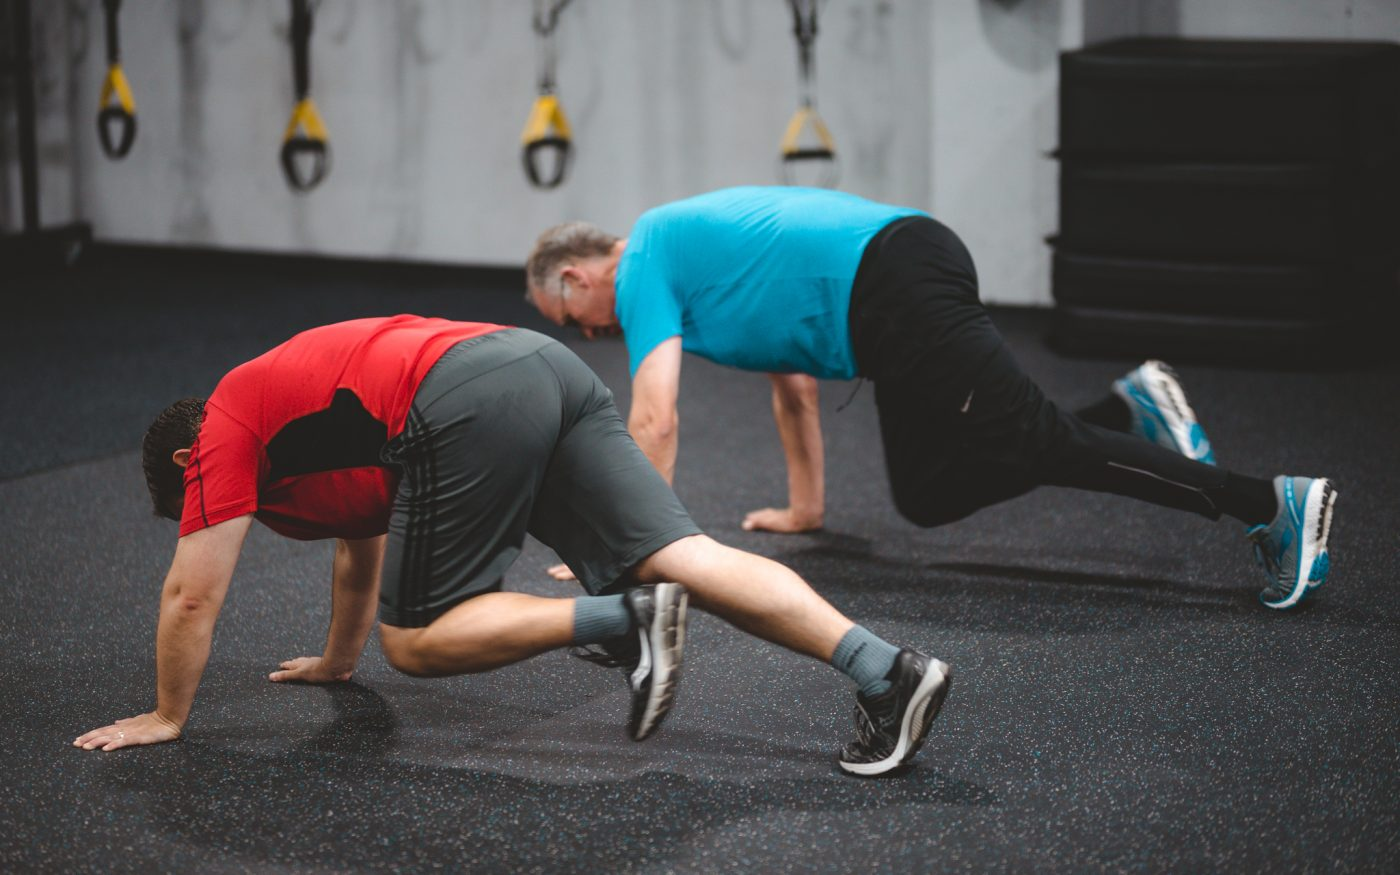 two men doing exercises